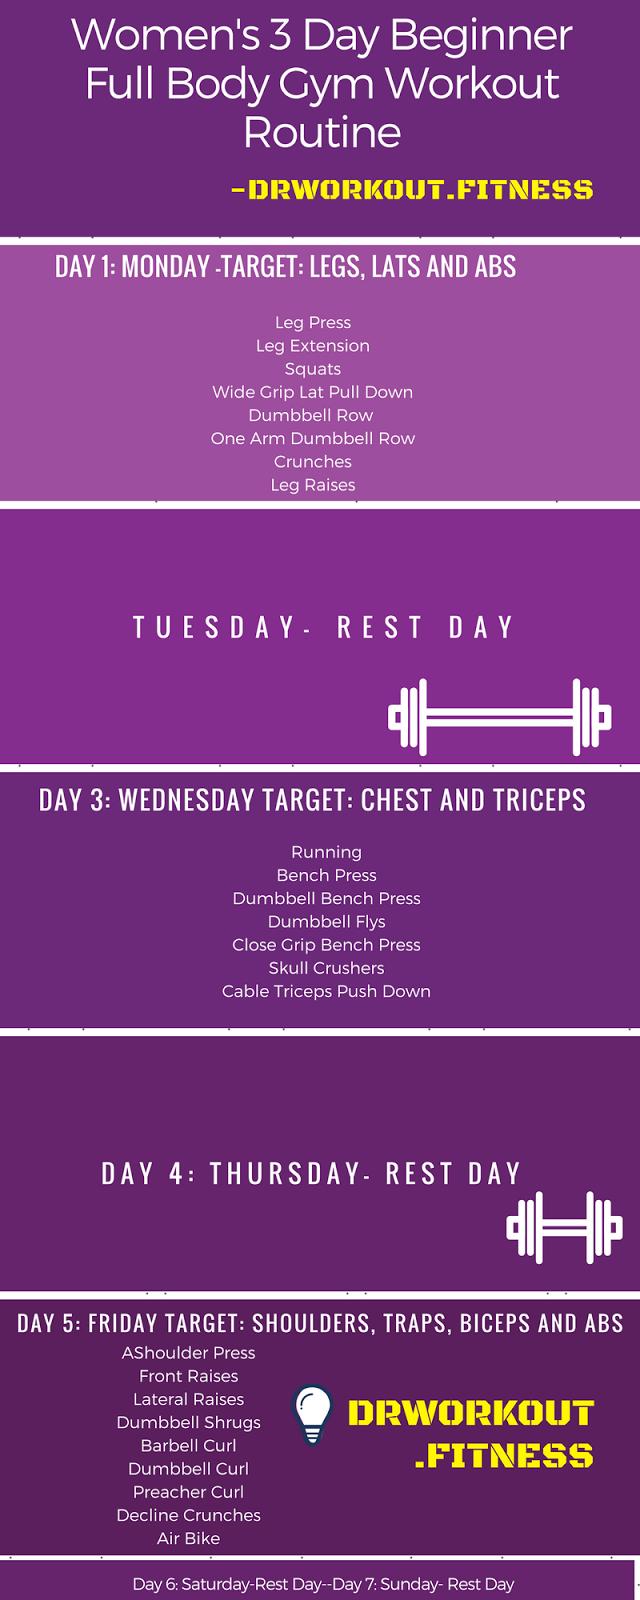 Women S 3 Day Beginner Full Body Gym Workout Plan Planet Fitness Workout Plan Full Body Gym Workout Gym Workout For Beginners